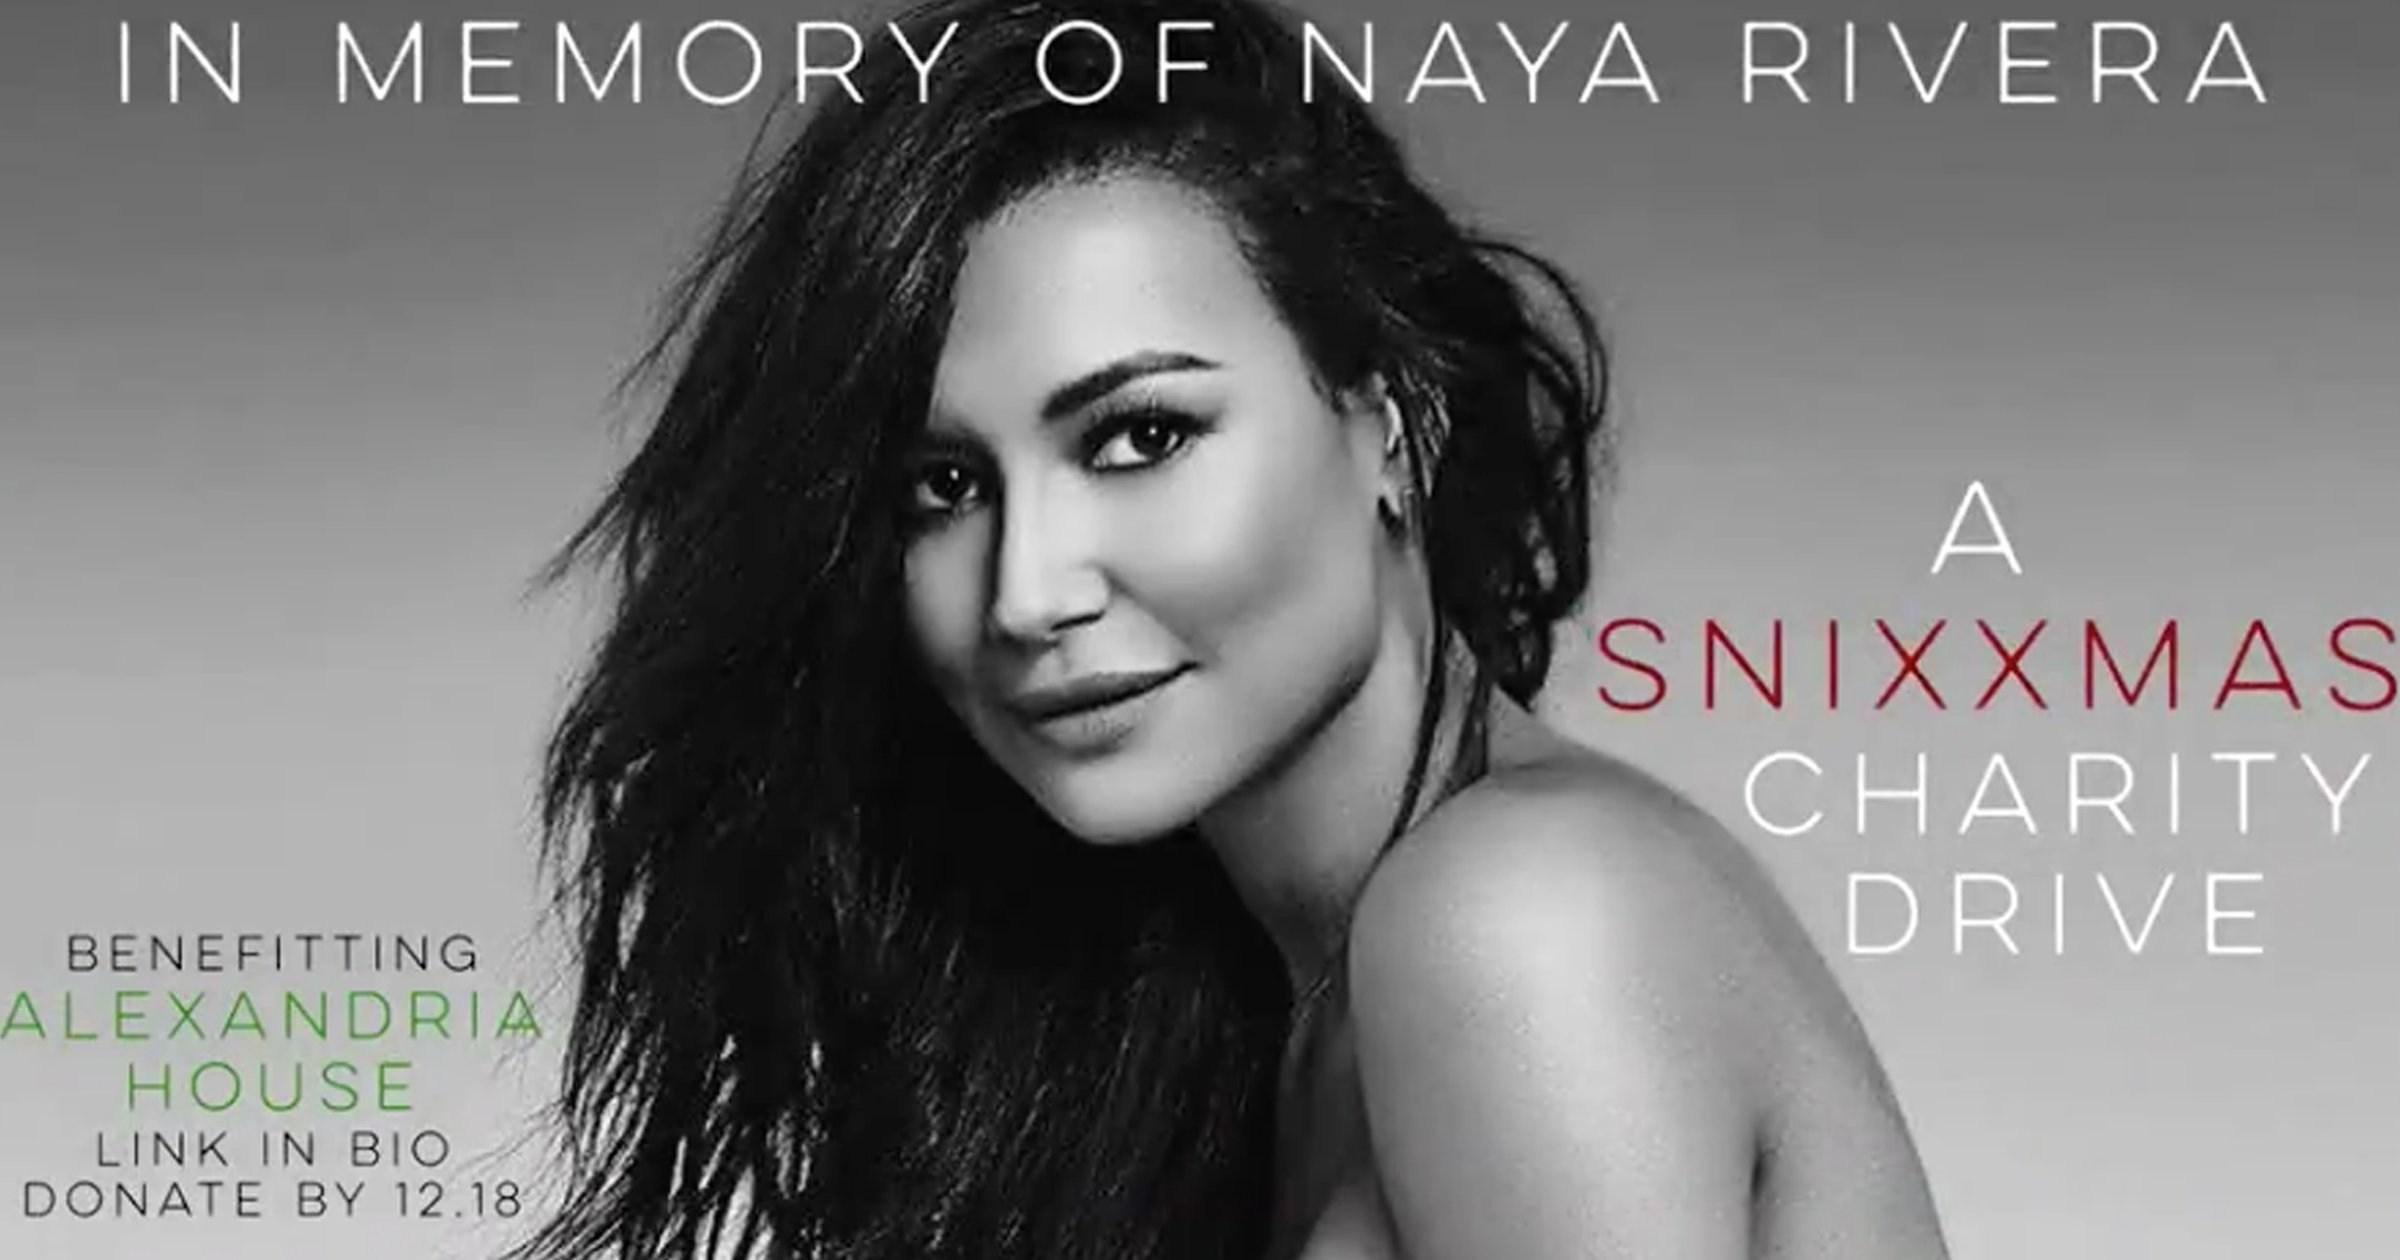 Glee cast launch Christmas charity fundraiser in Naya Rivera's memory